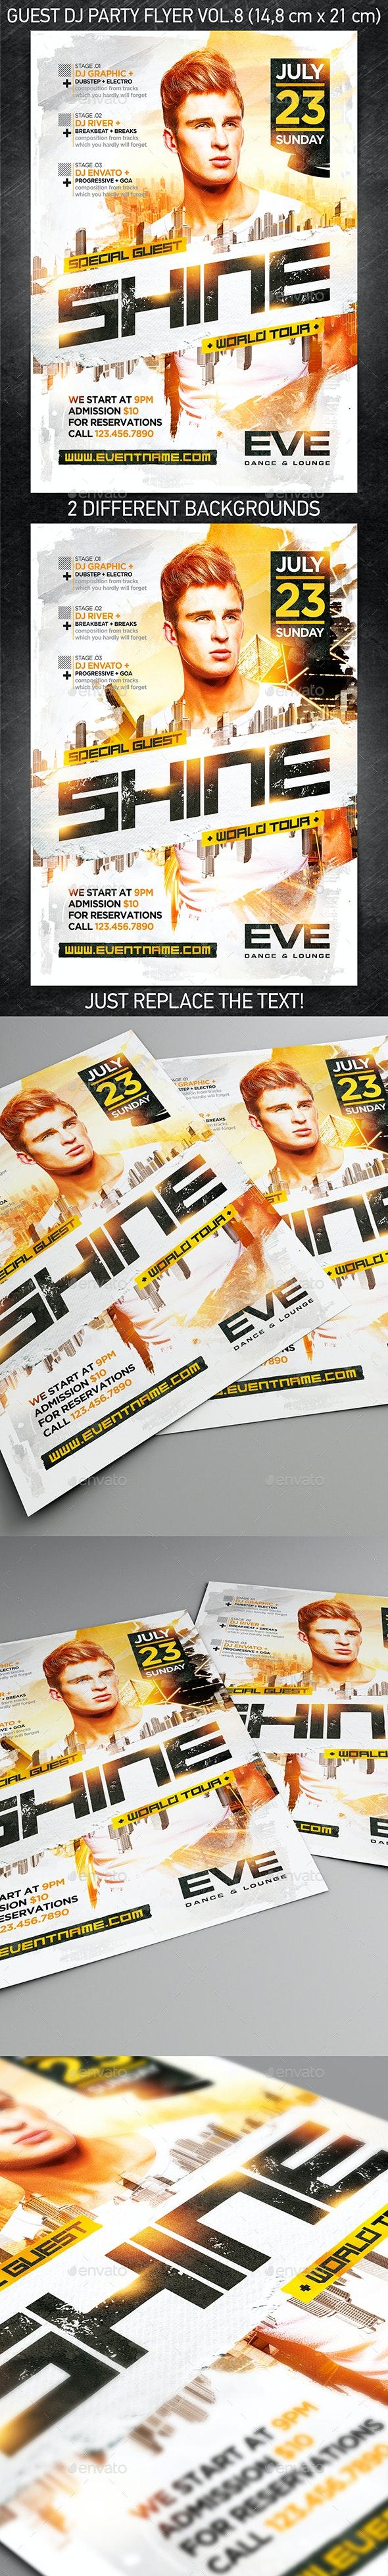 Guest DJ Party Flyer vol.8 - Events Flyers